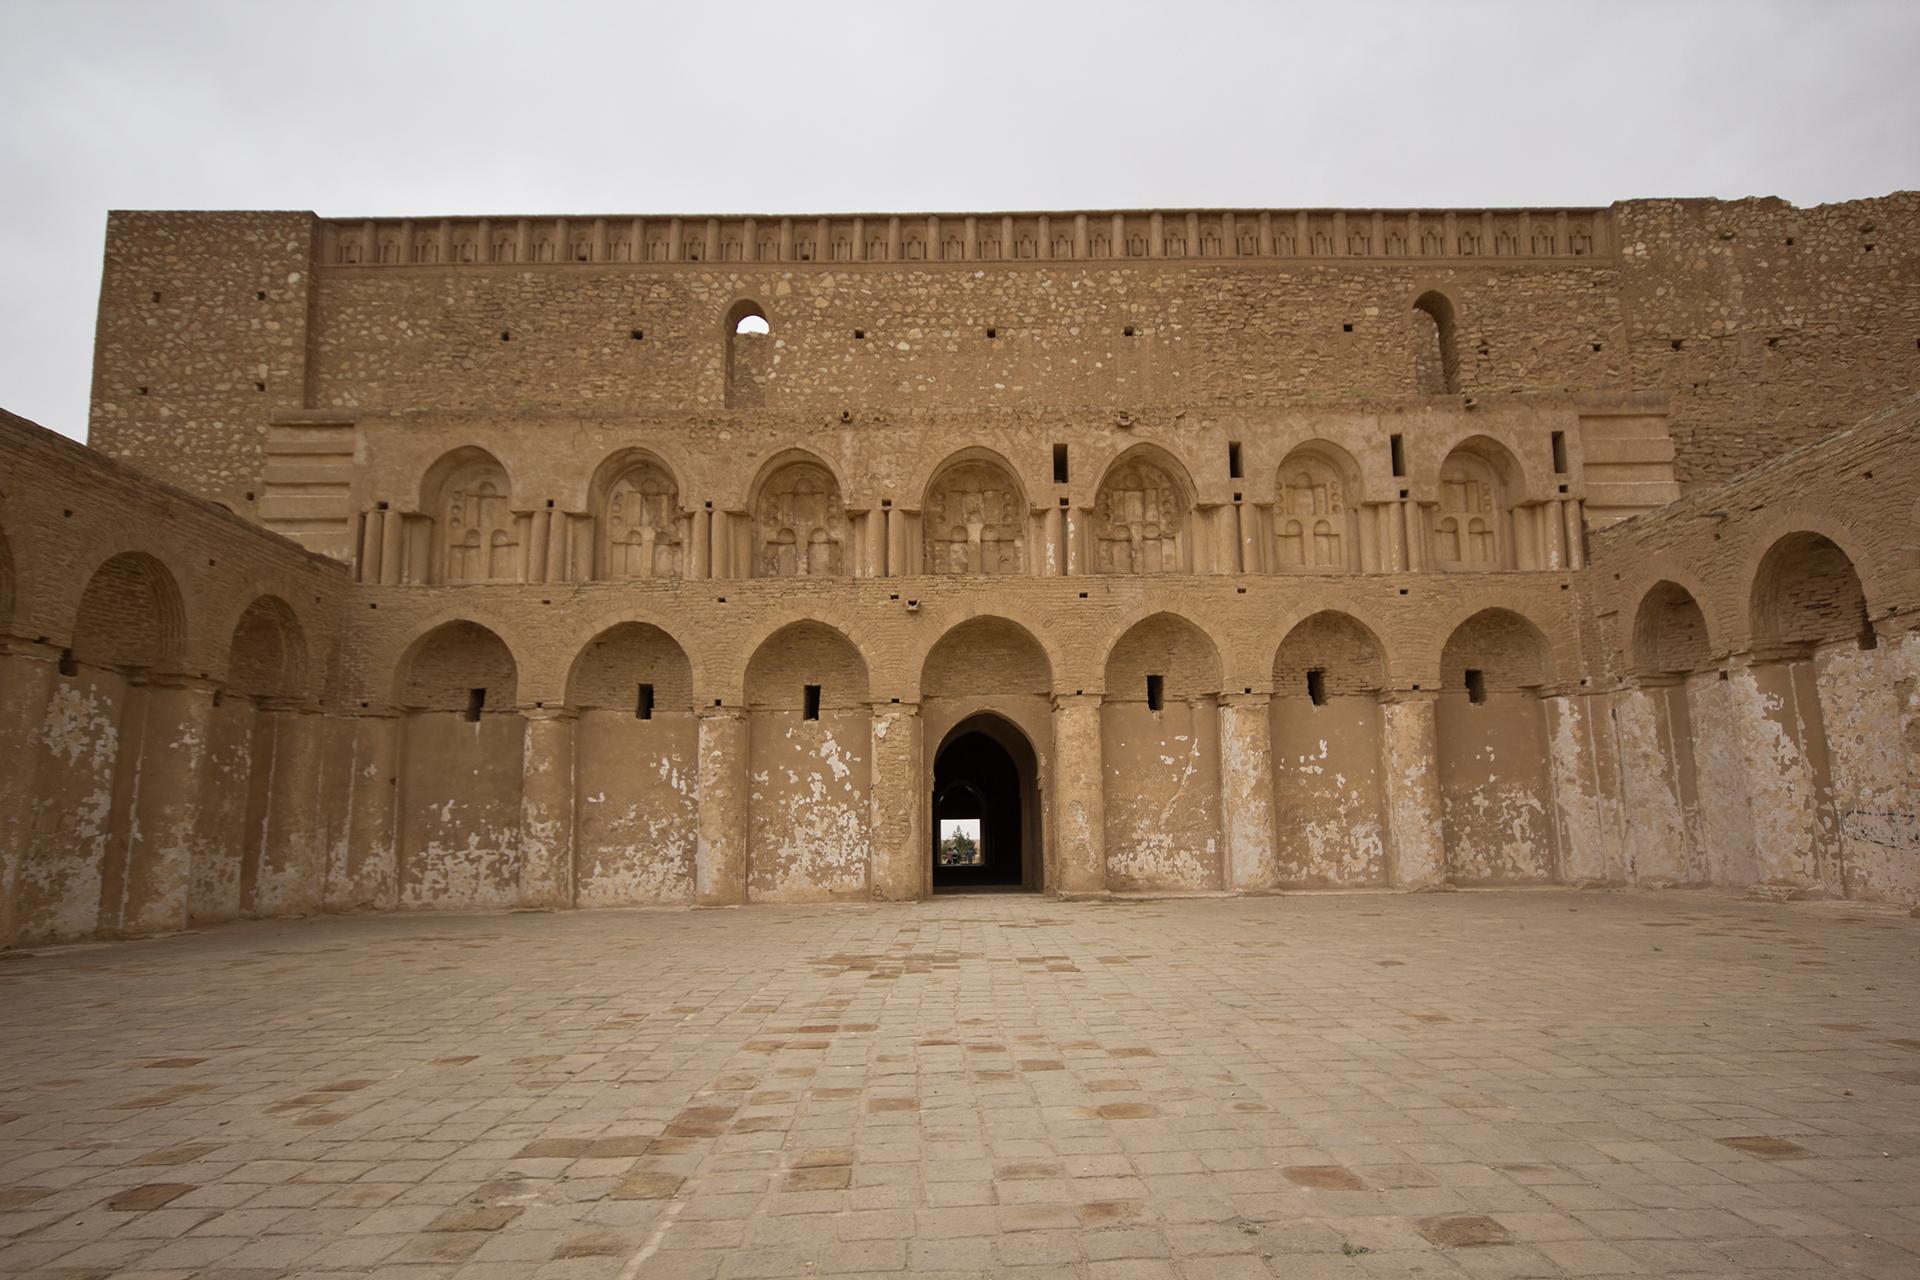 The vast 9th century fortress of Al-Ukhaidir, Karbala (MEE/Charlotte Mayhew)